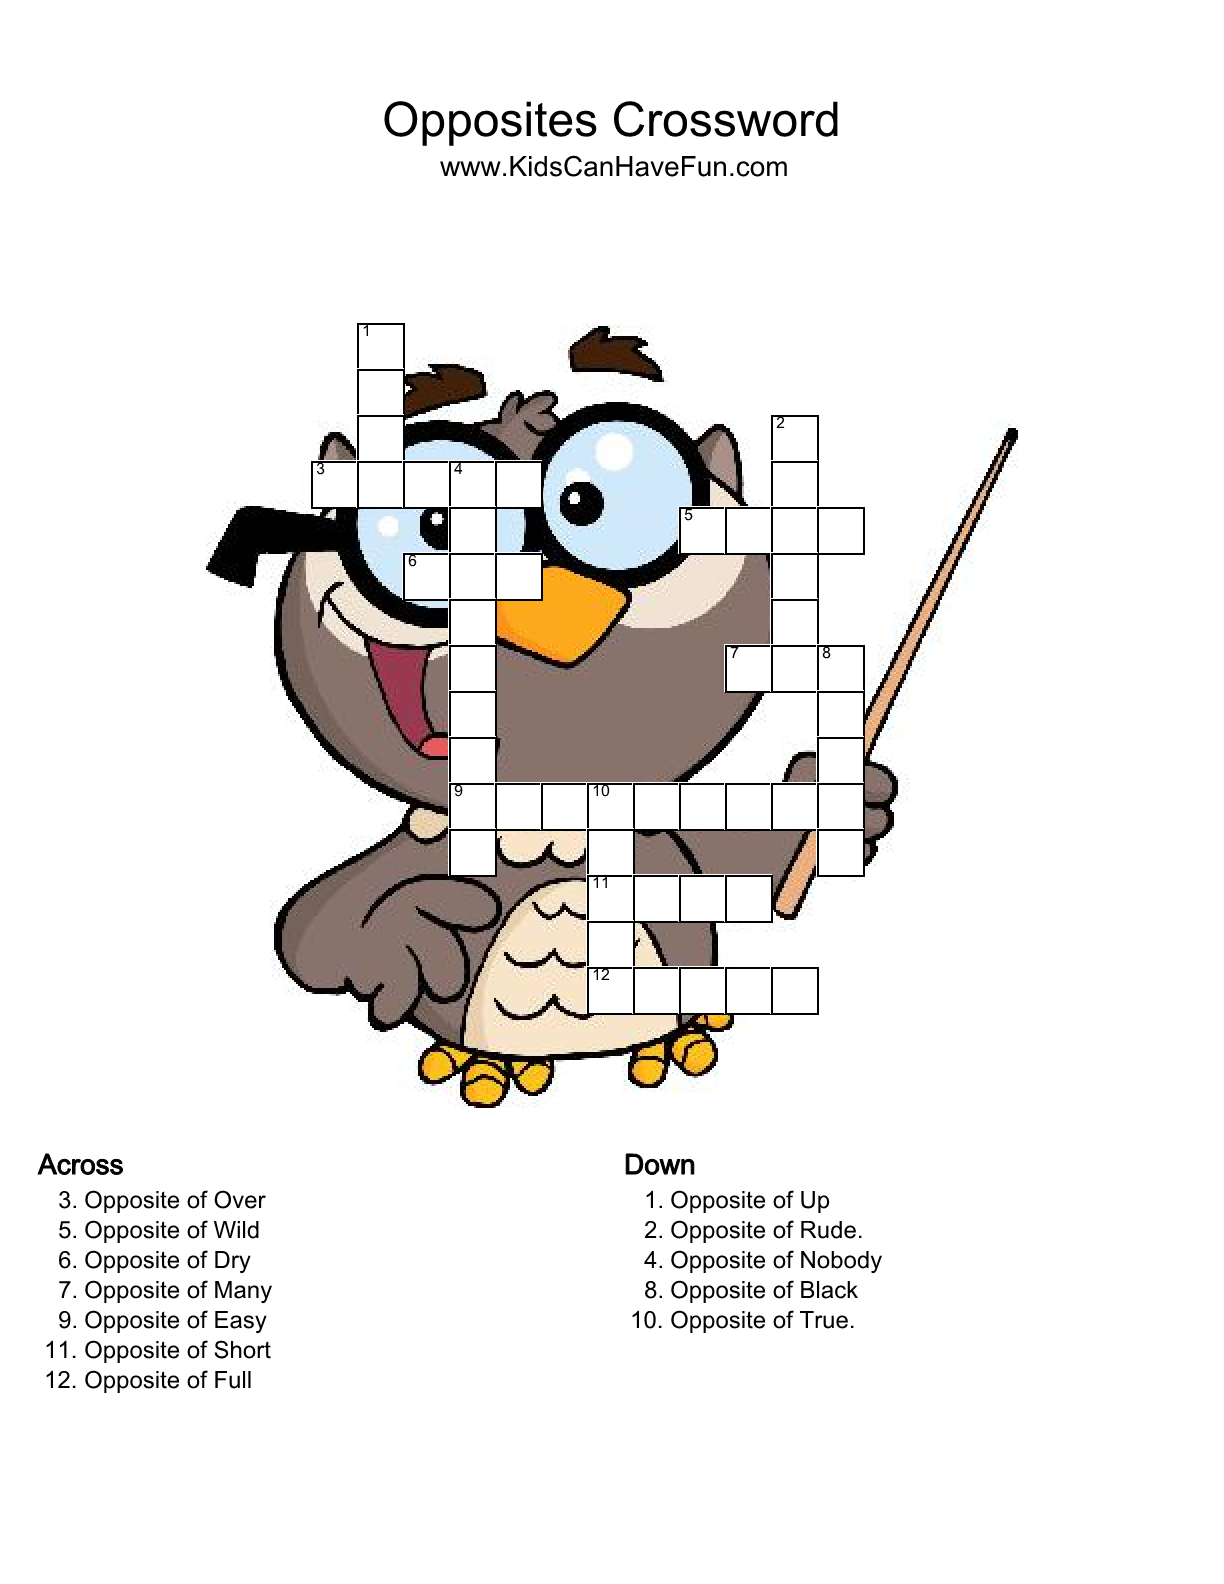 Crossword Quiz Opposites Level 8